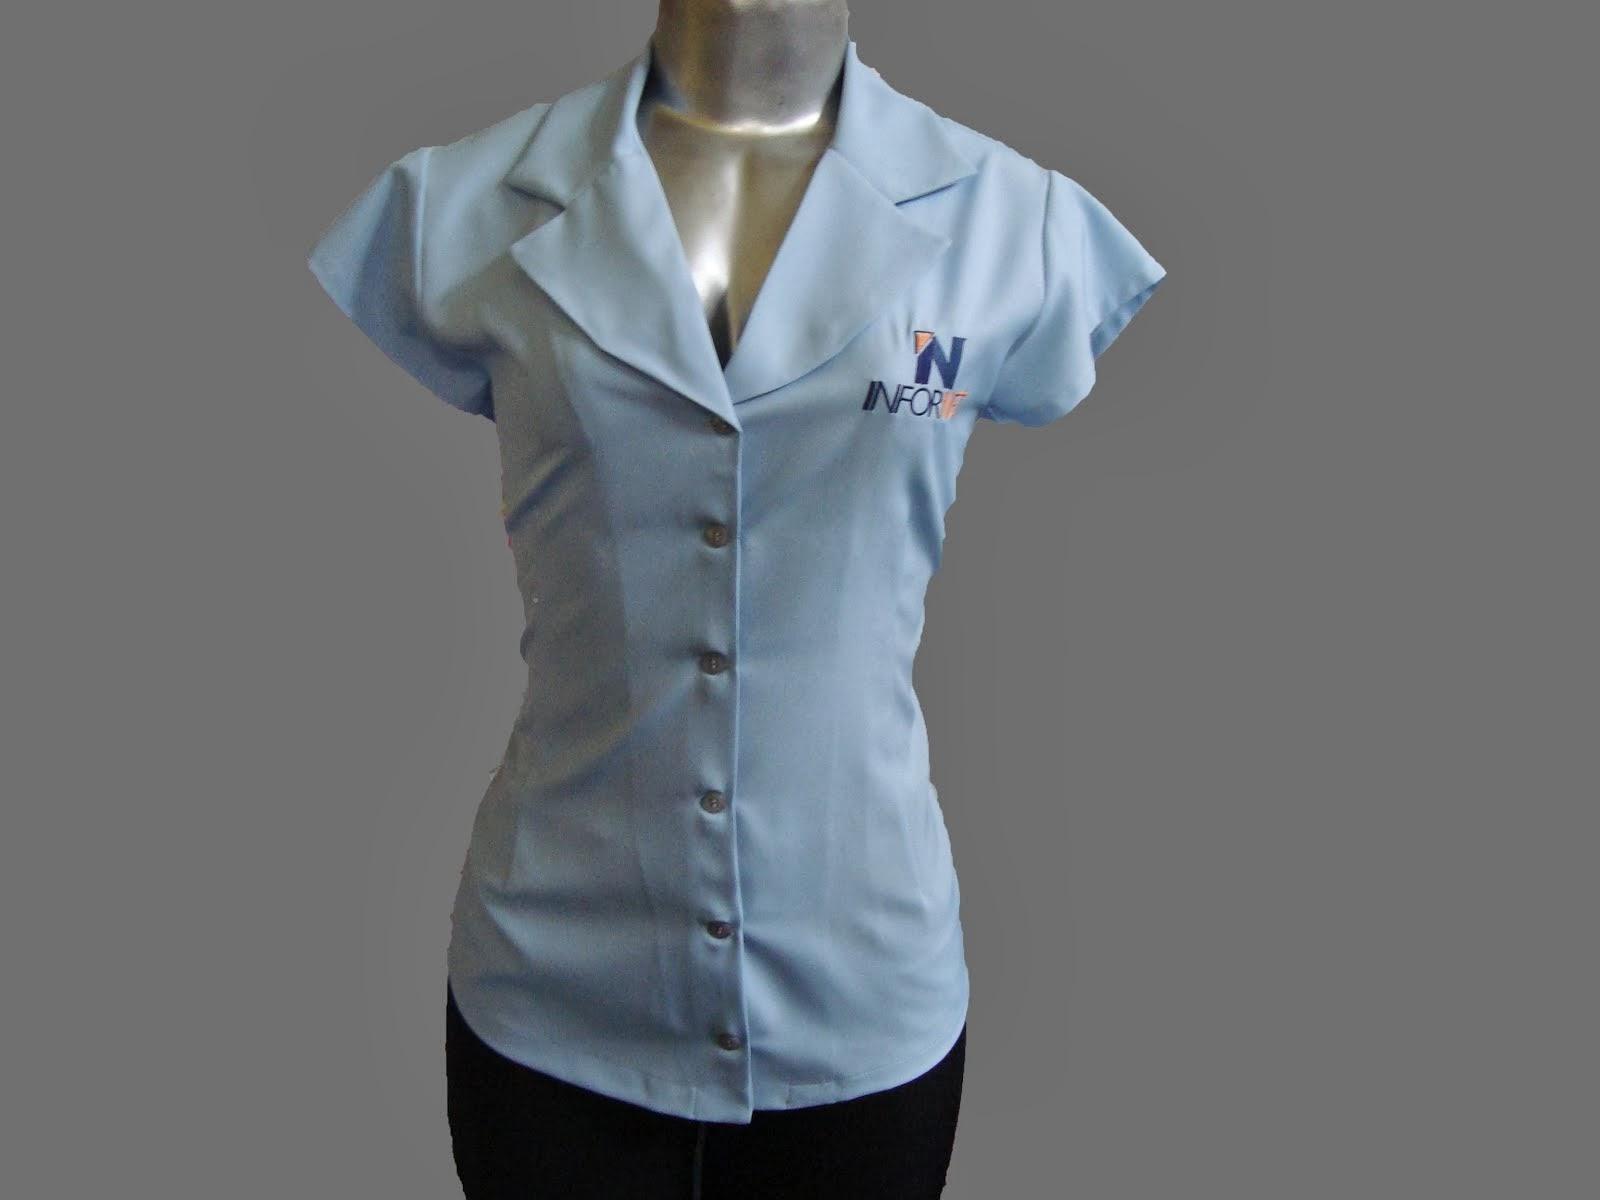 uniforme Infornet